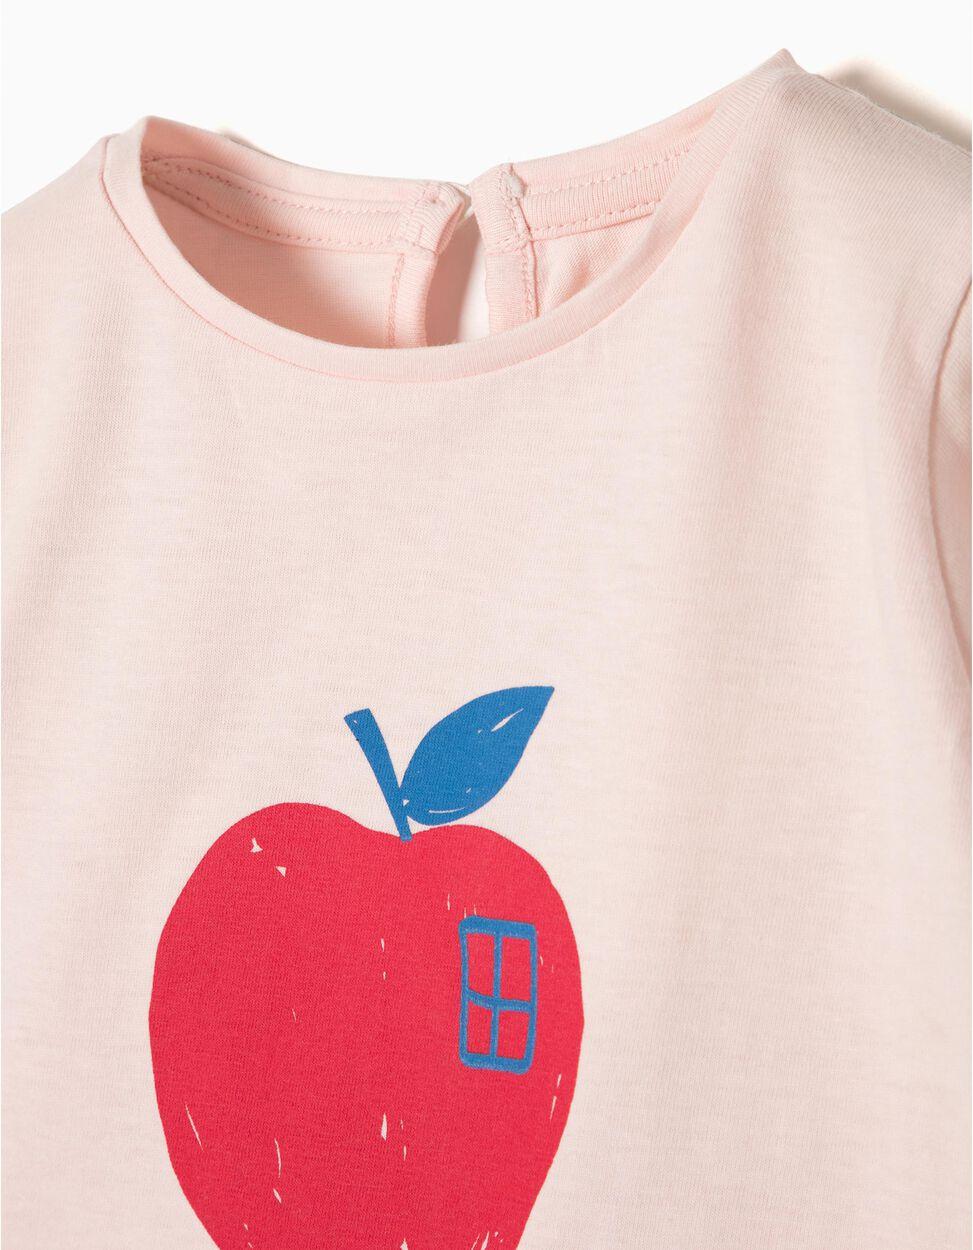 T-shirt Manga Comprida Apple Love